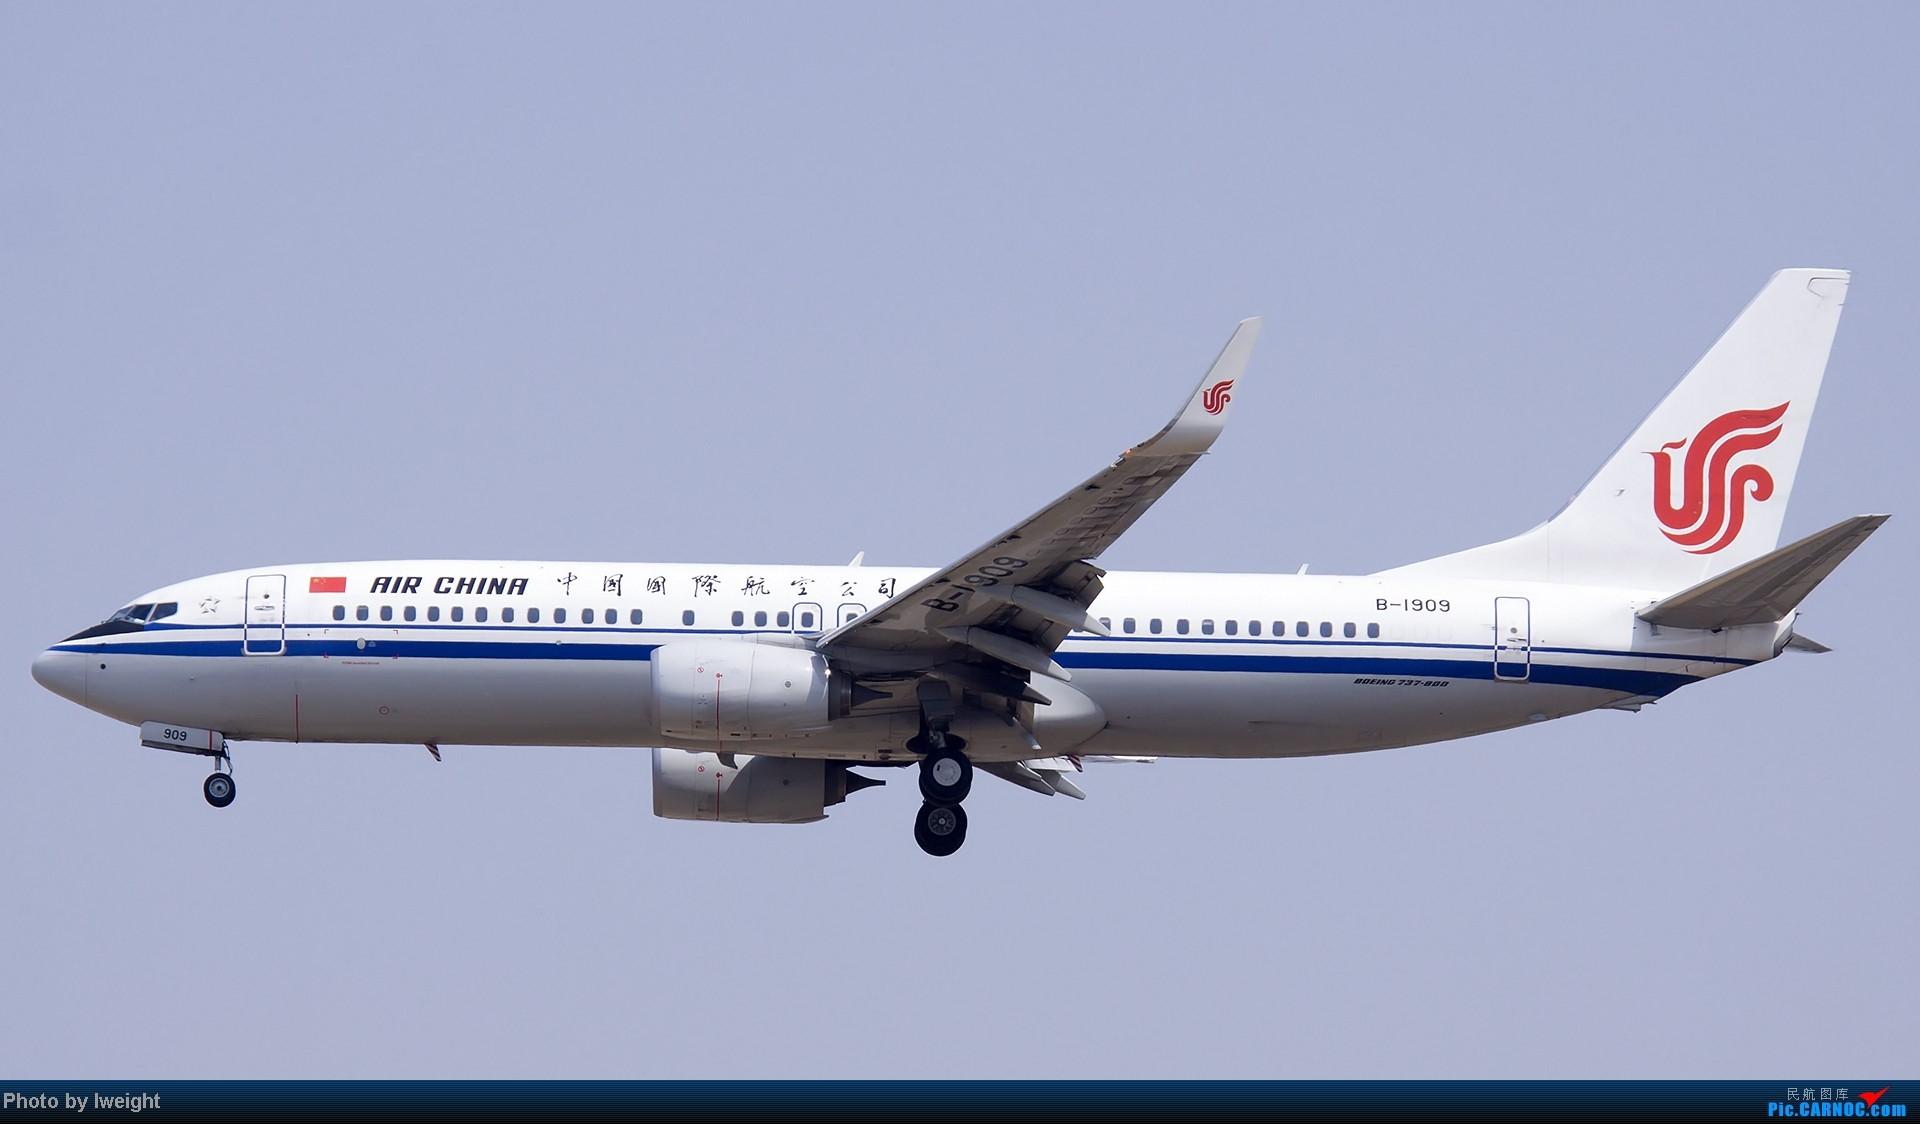 Re:[原创]错过了卡航的巴塞罗那号,只有这些大路货了,泪奔啊 BOEING 737-800 B-1909 中国北京首都机场